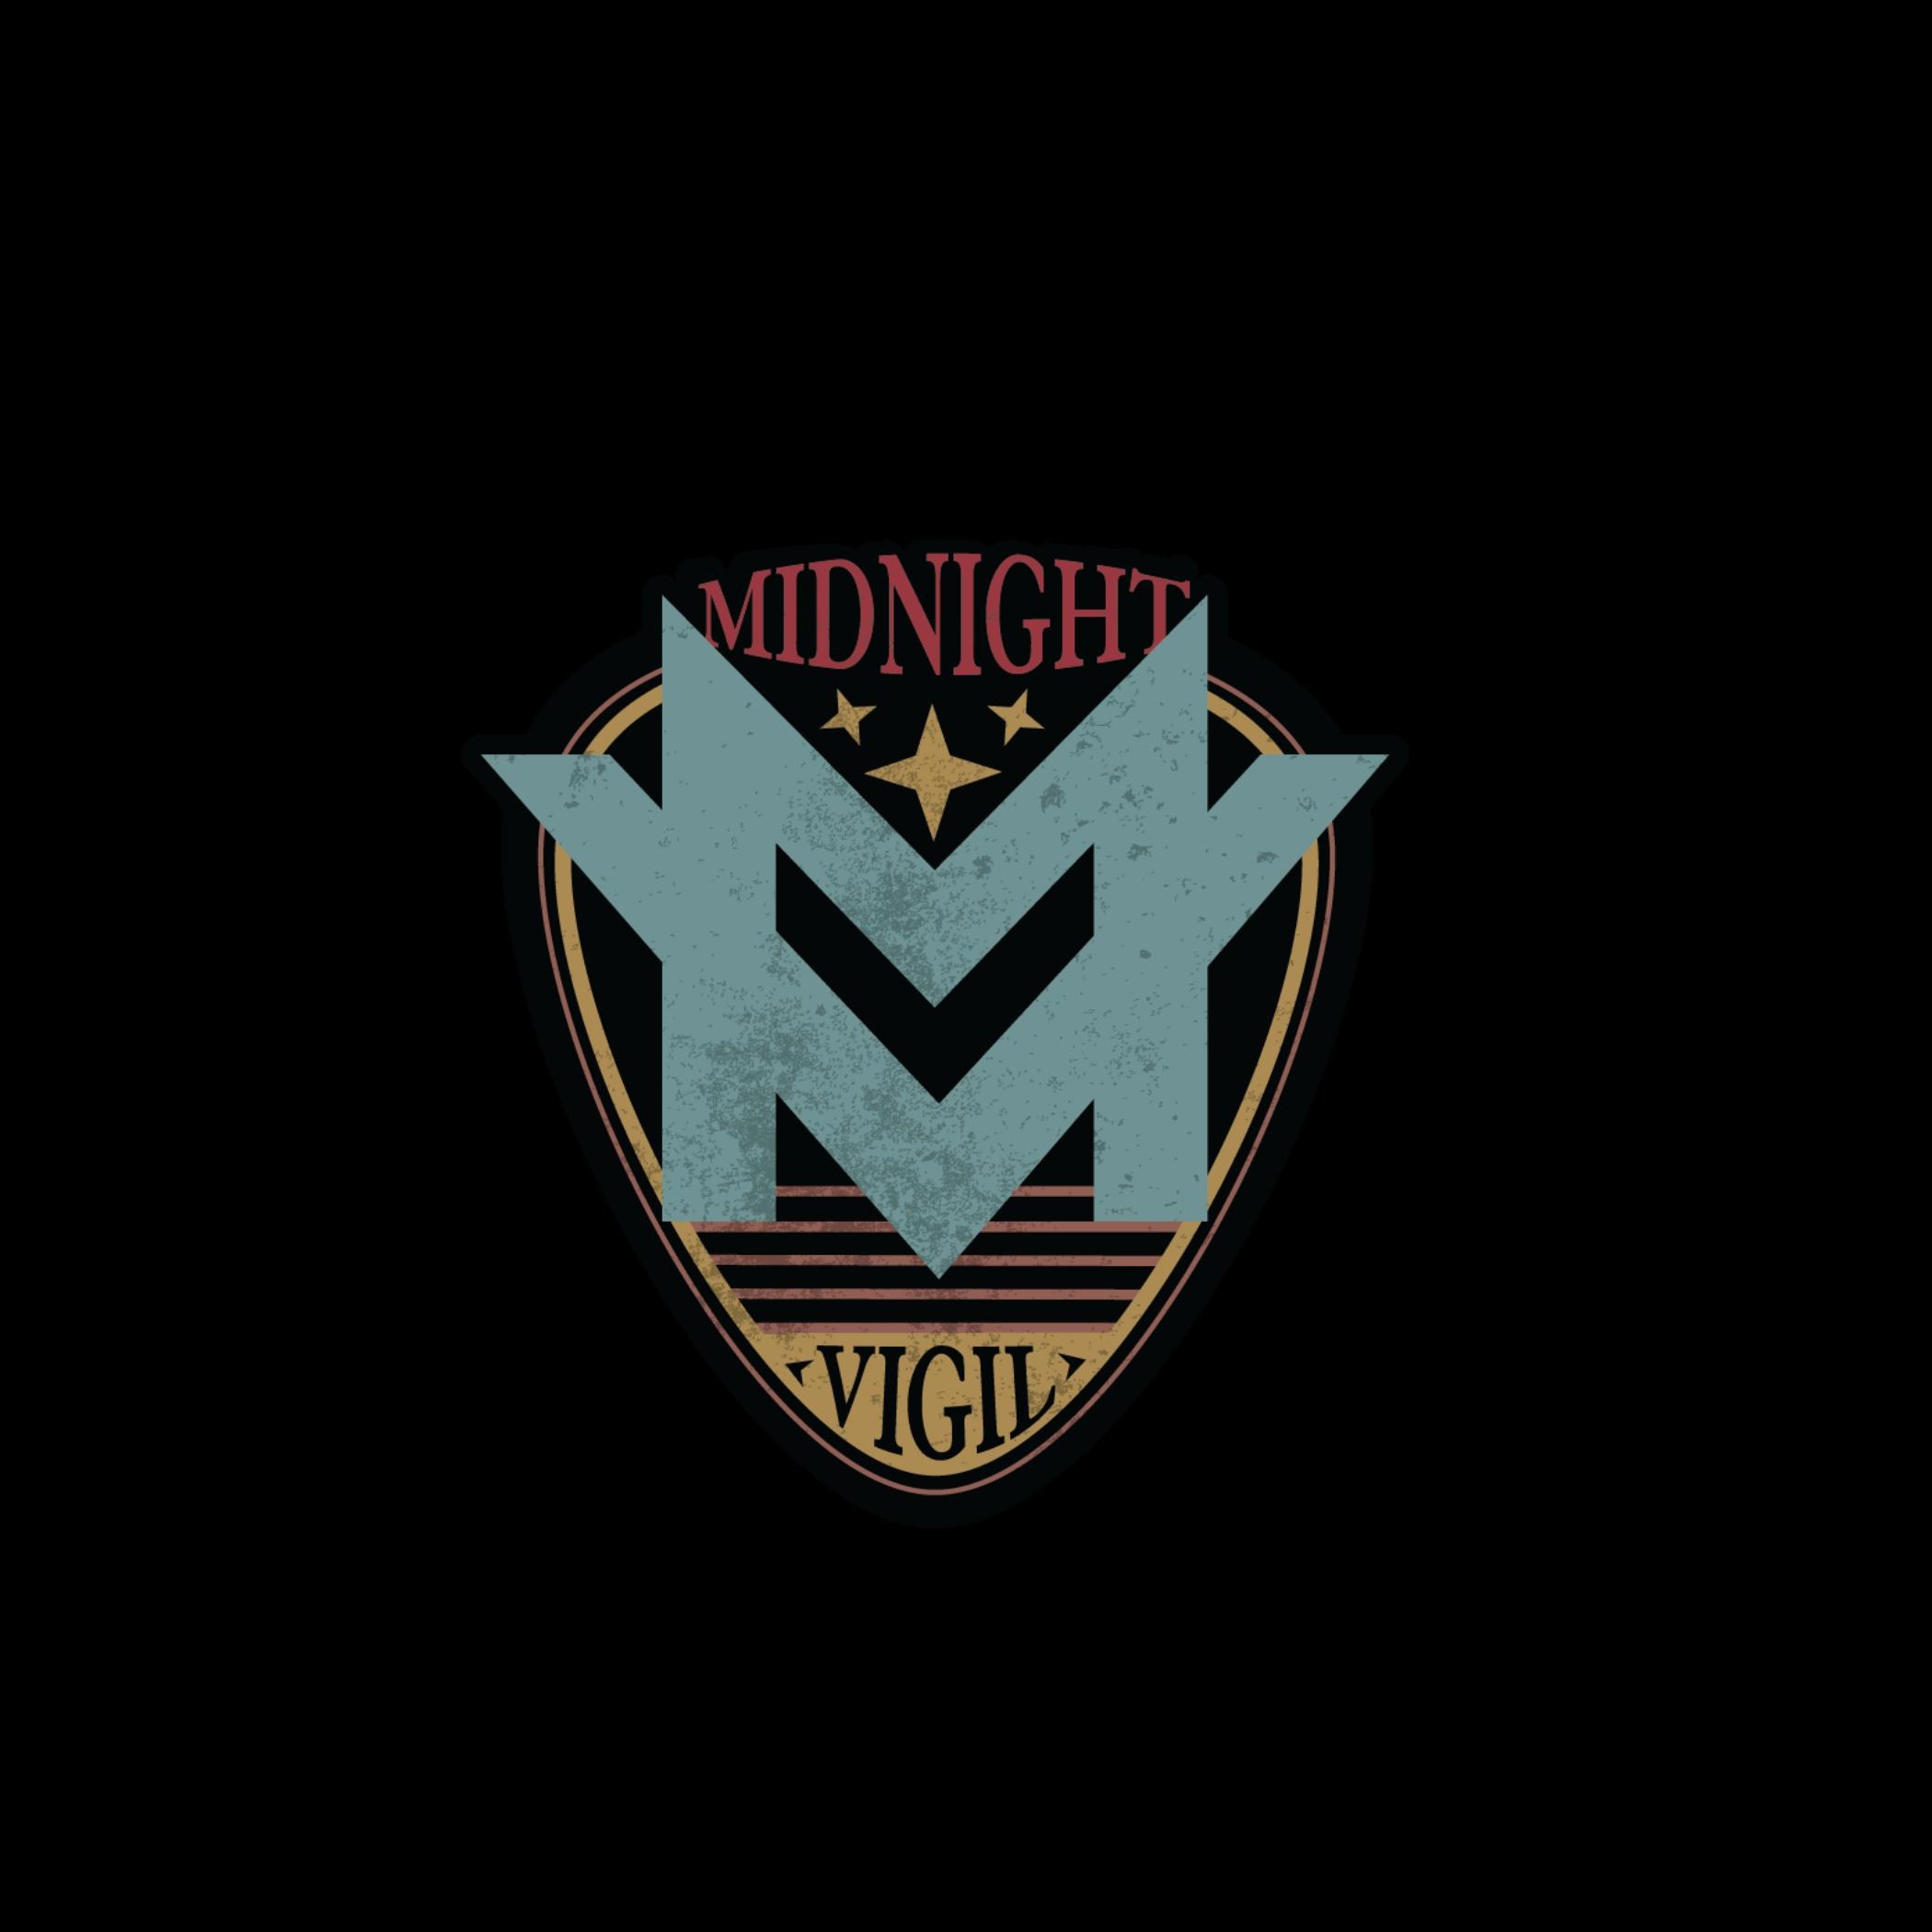 midnightvigil Cover